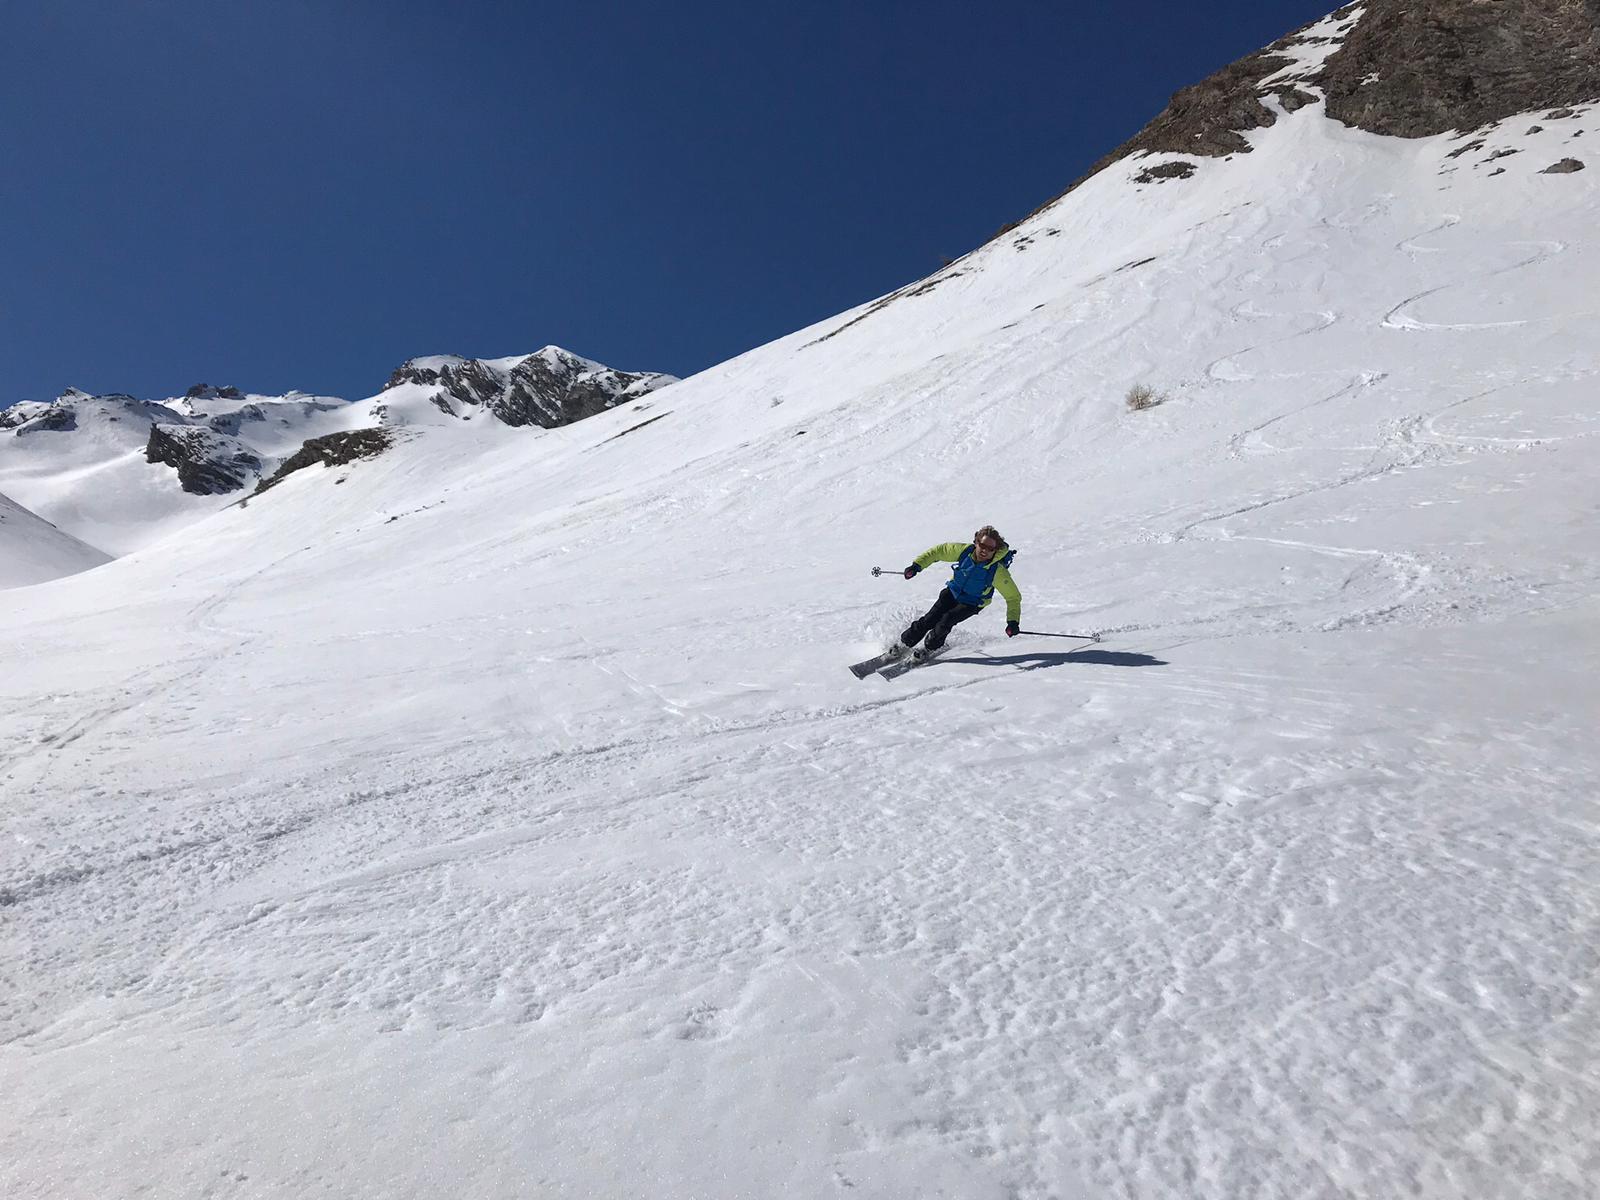 Nowcasting Piemonte 17 Marzo - 31 Maggio 2019-img-20190317-wa0030.jpg